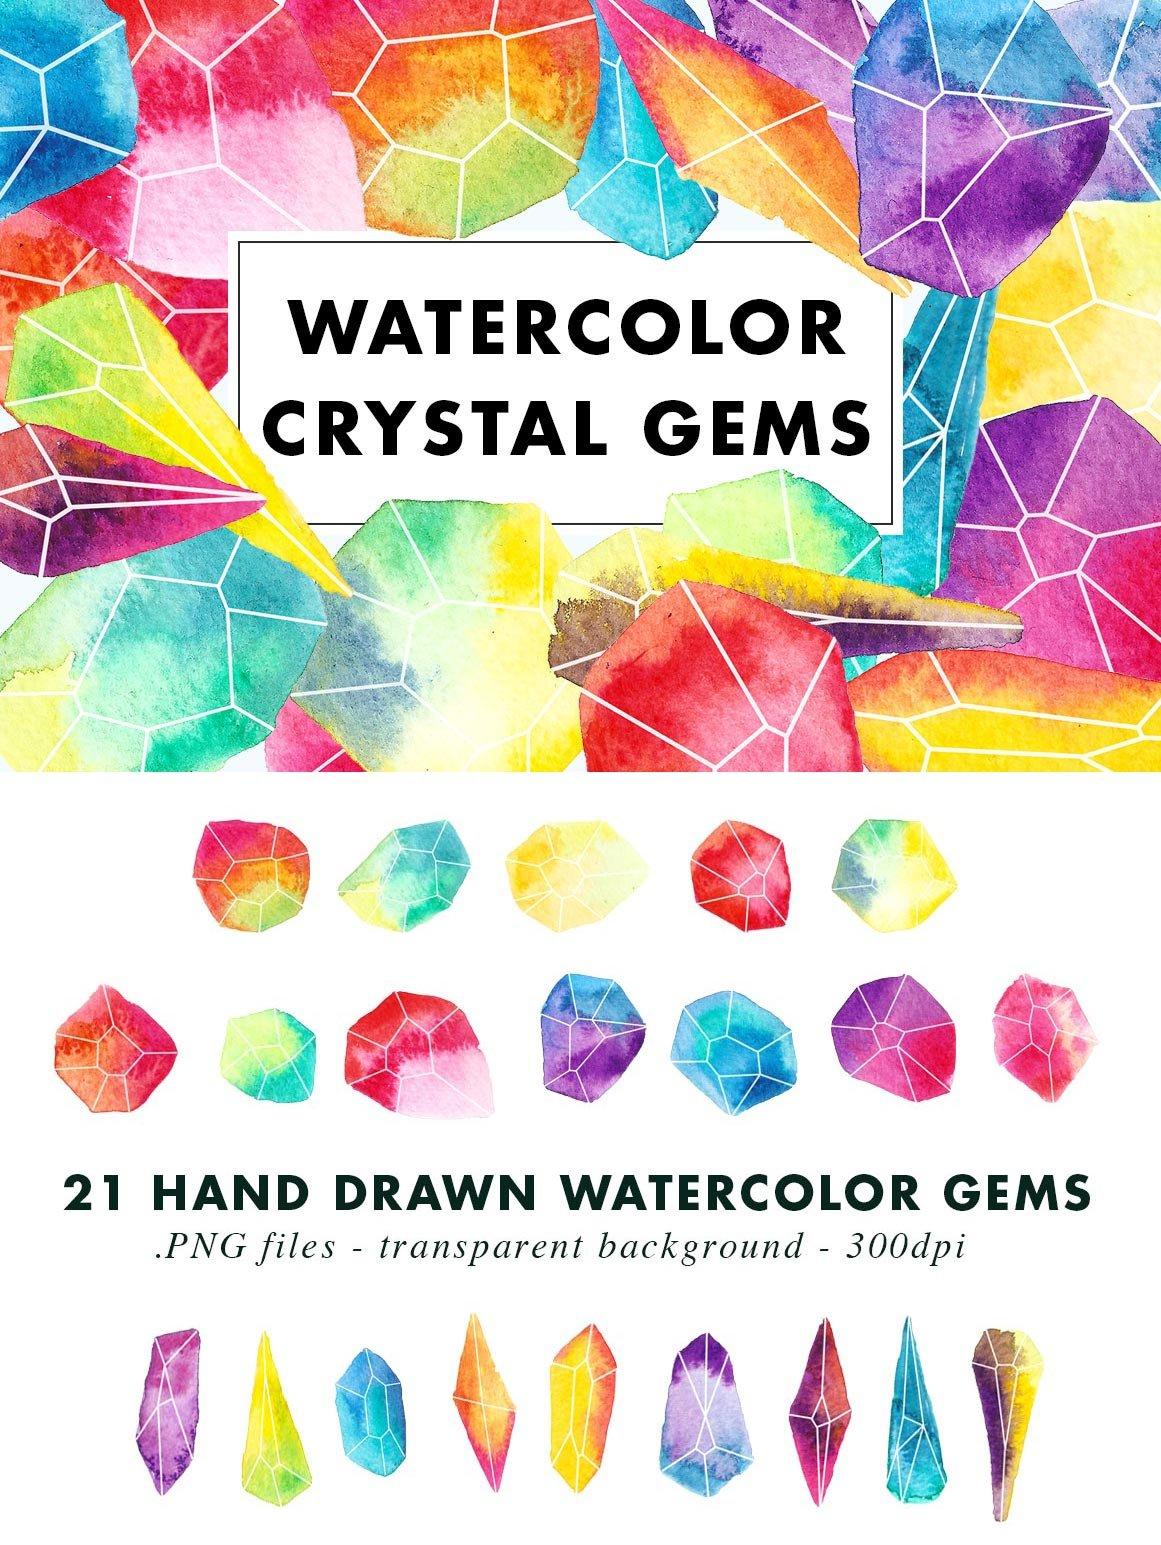 Watercolor Crystal Gems ~ Illustrations ~ Creative Market